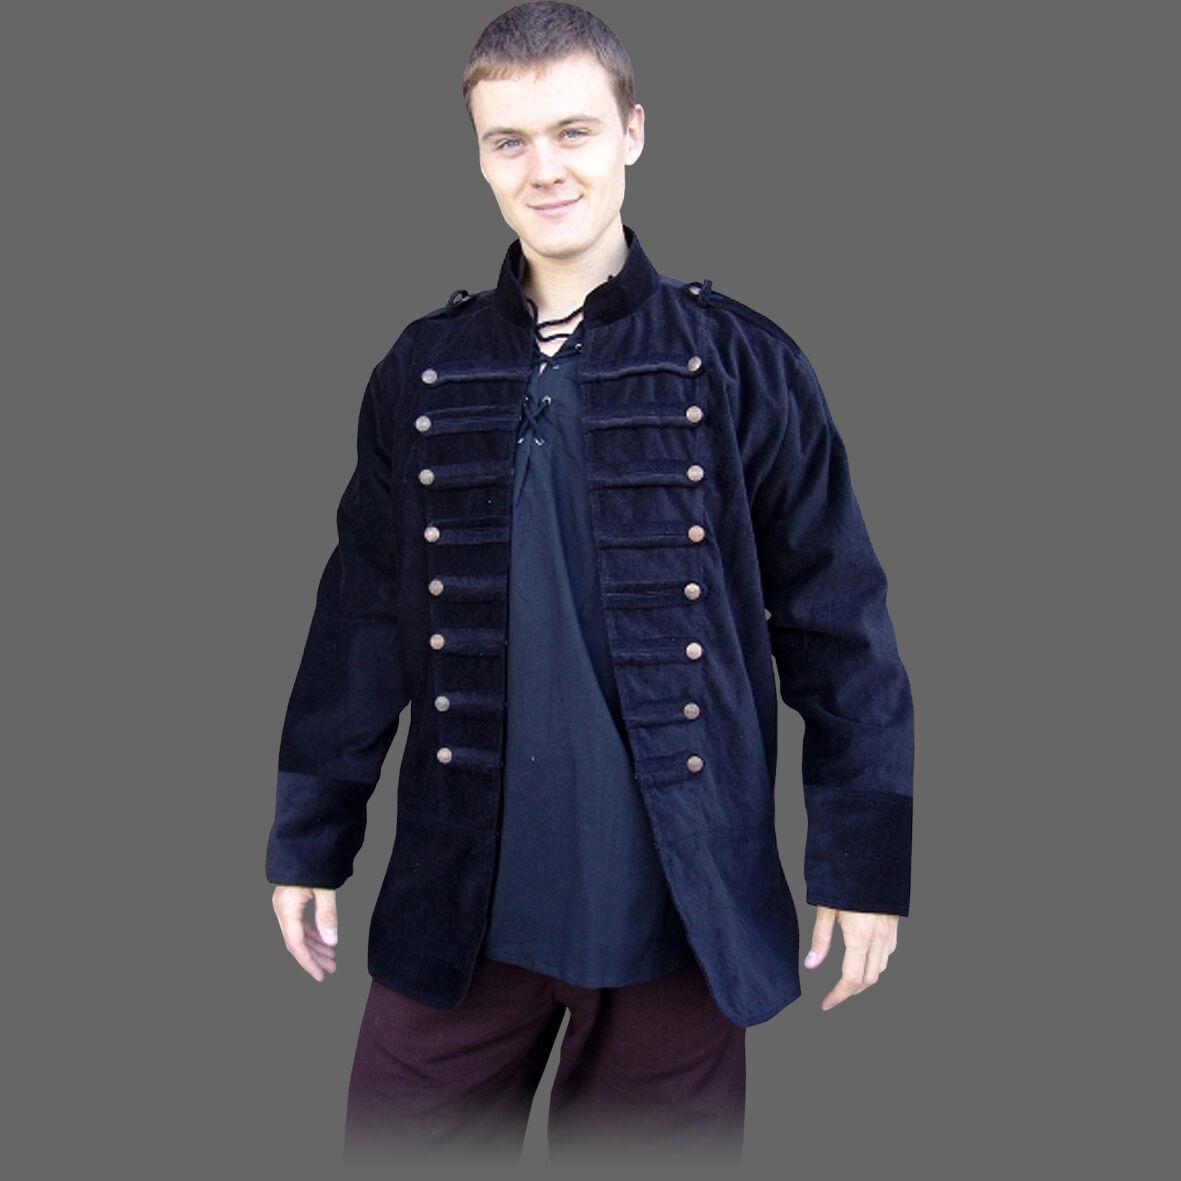 Giacca IN STILE UNIFORM-S-XXXL - 2 colori-medioevo pirati Giacca Giacca pirati Militare da05d5